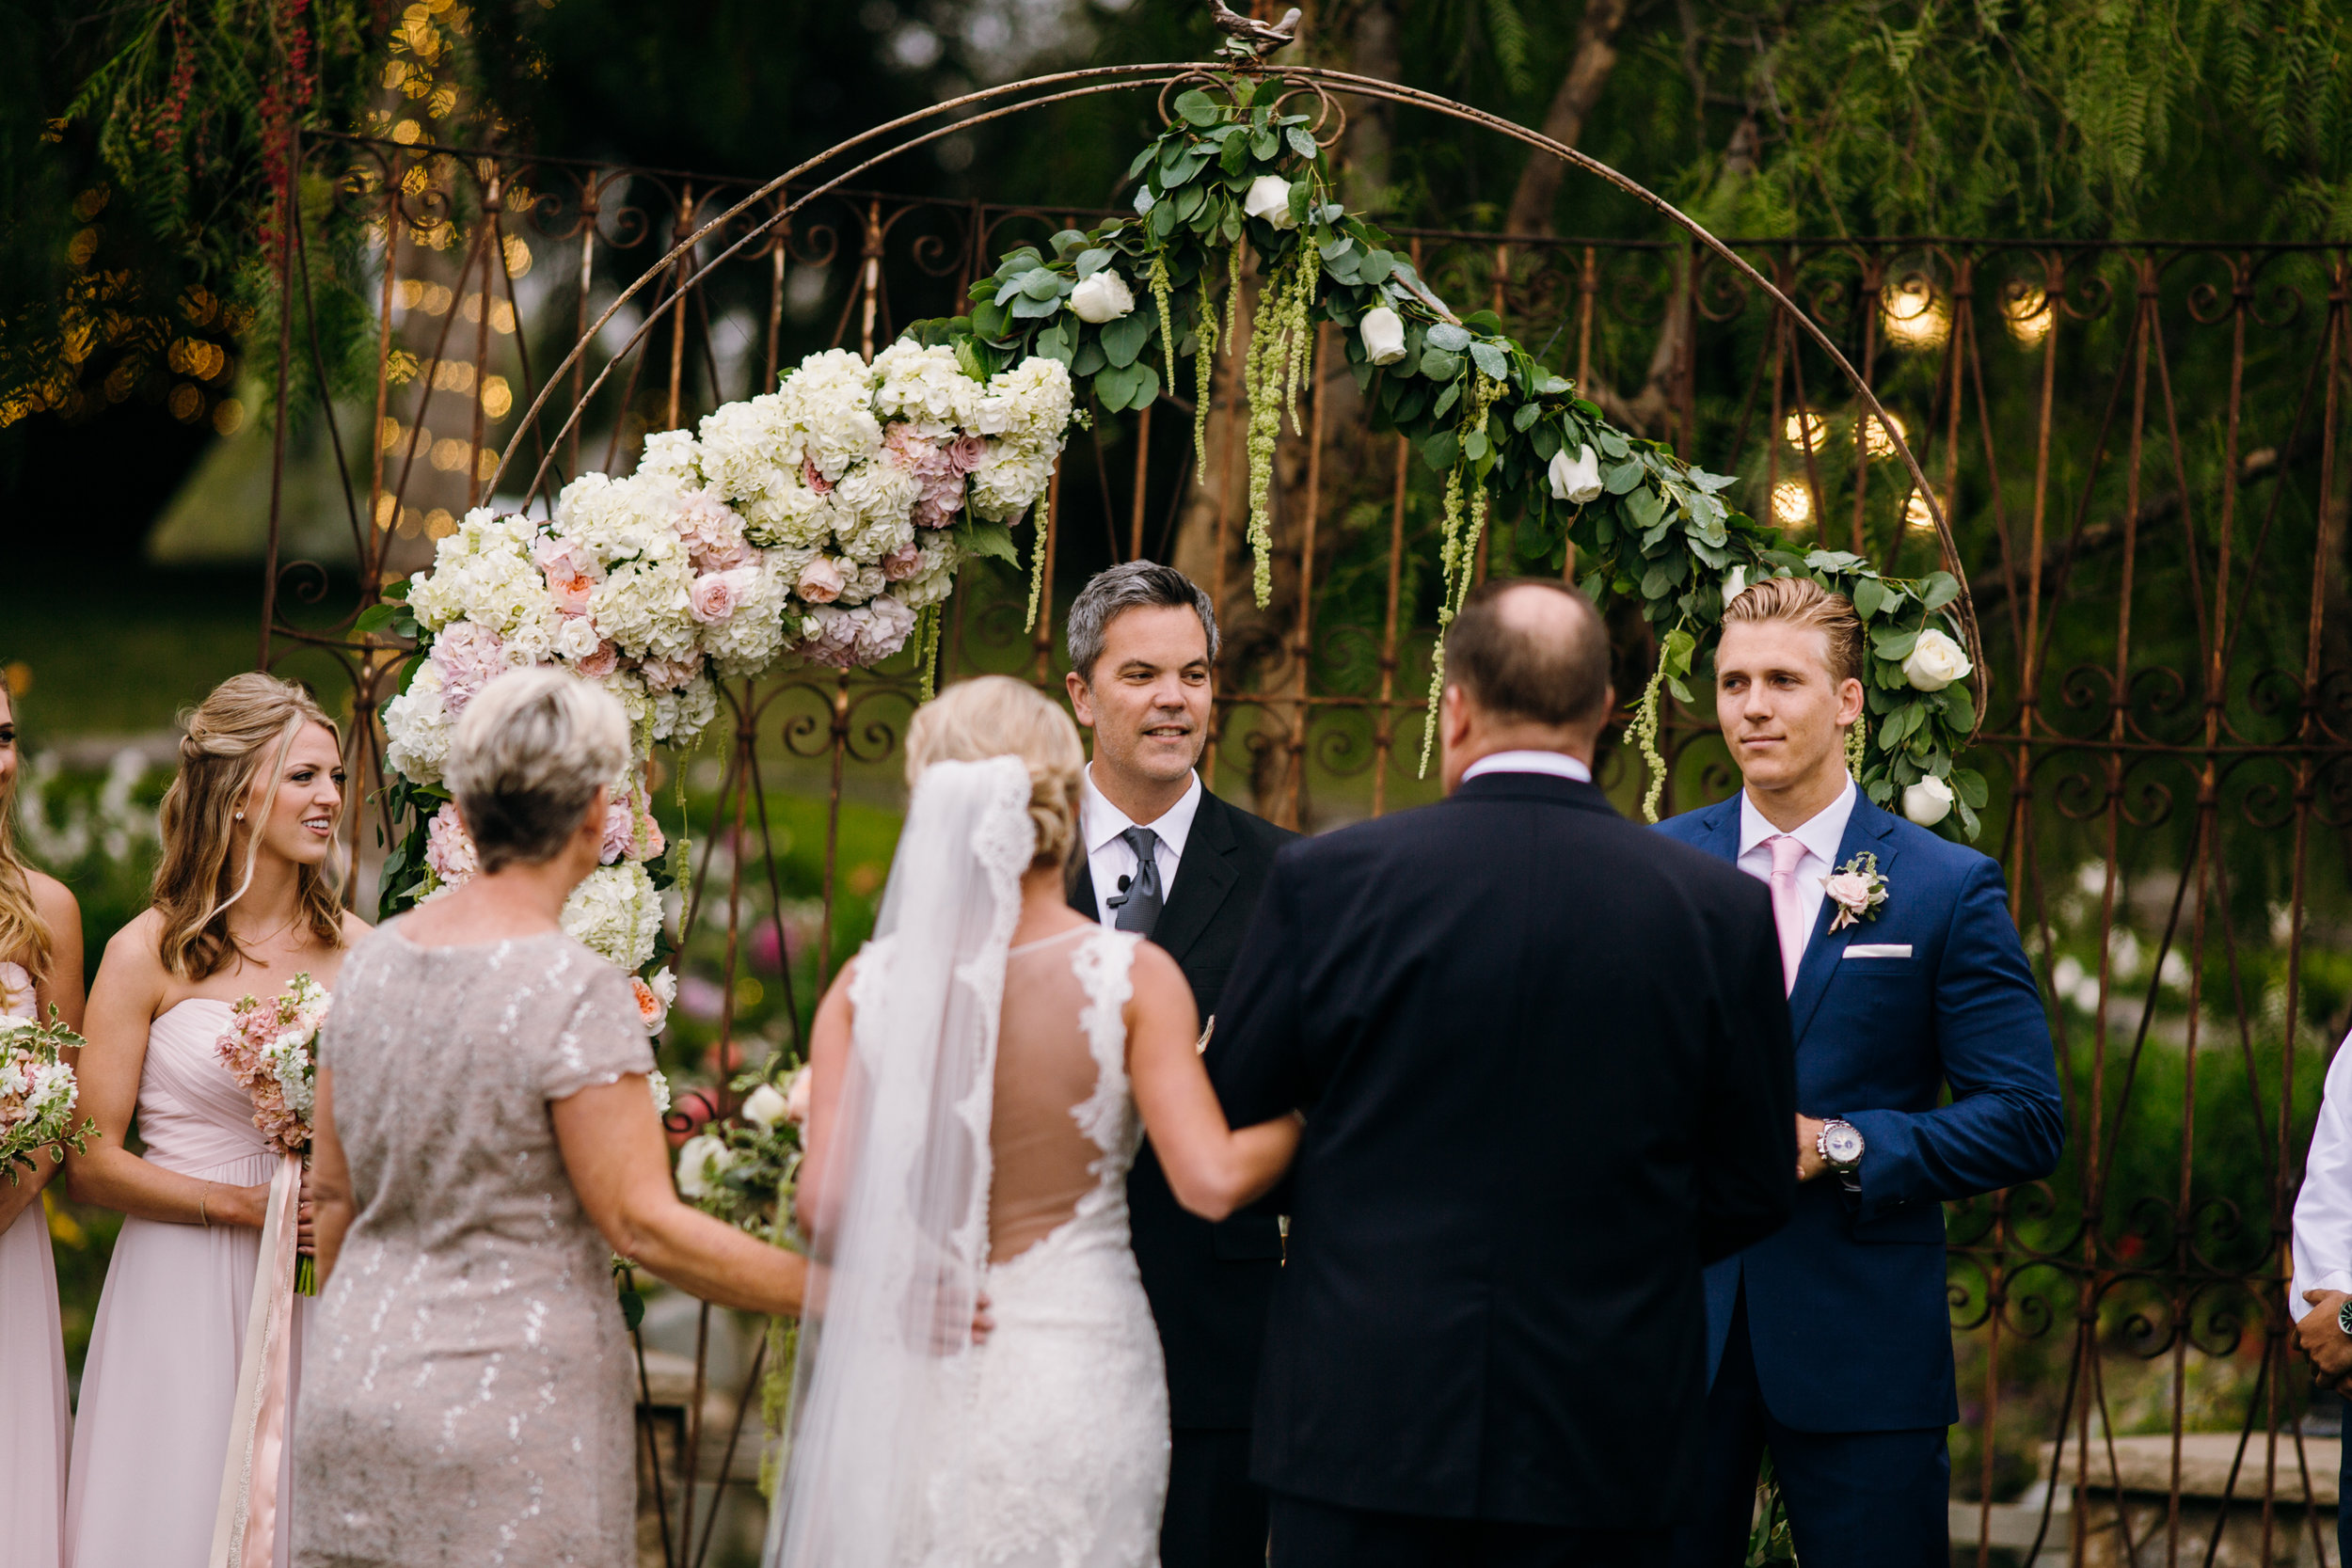 KaraNixonWeddings-LakeOakMeadows-Temecula-Wedding-31.jpg